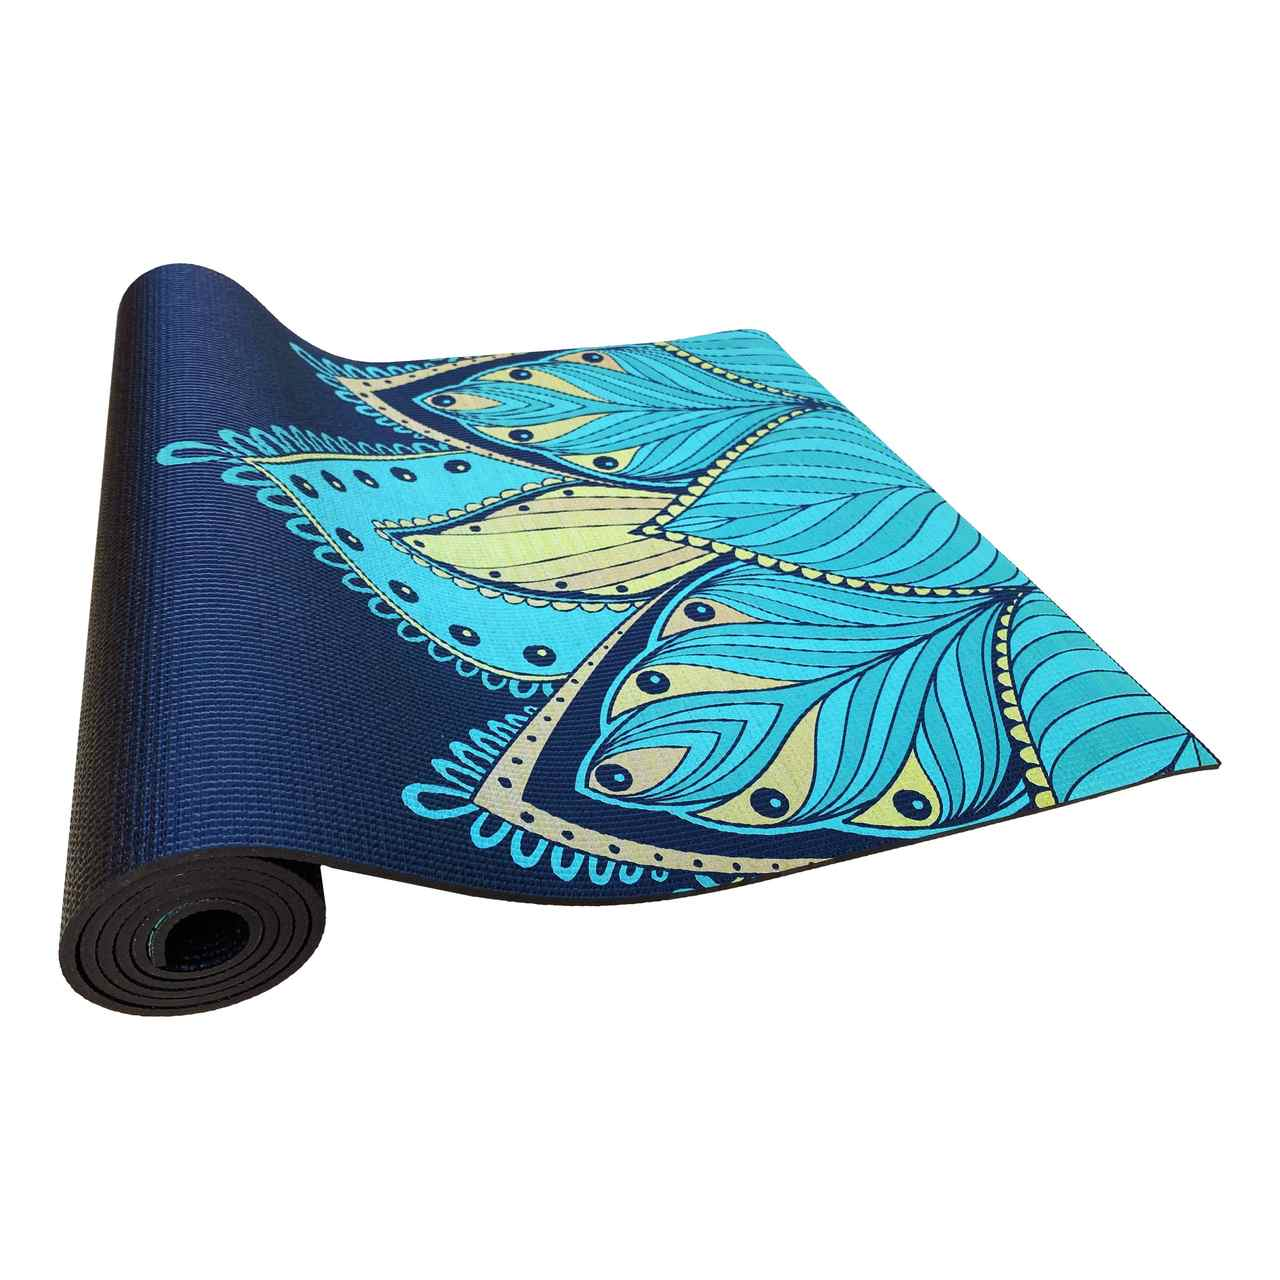 Tapete de Yoga PVC Estampado - Floral Om